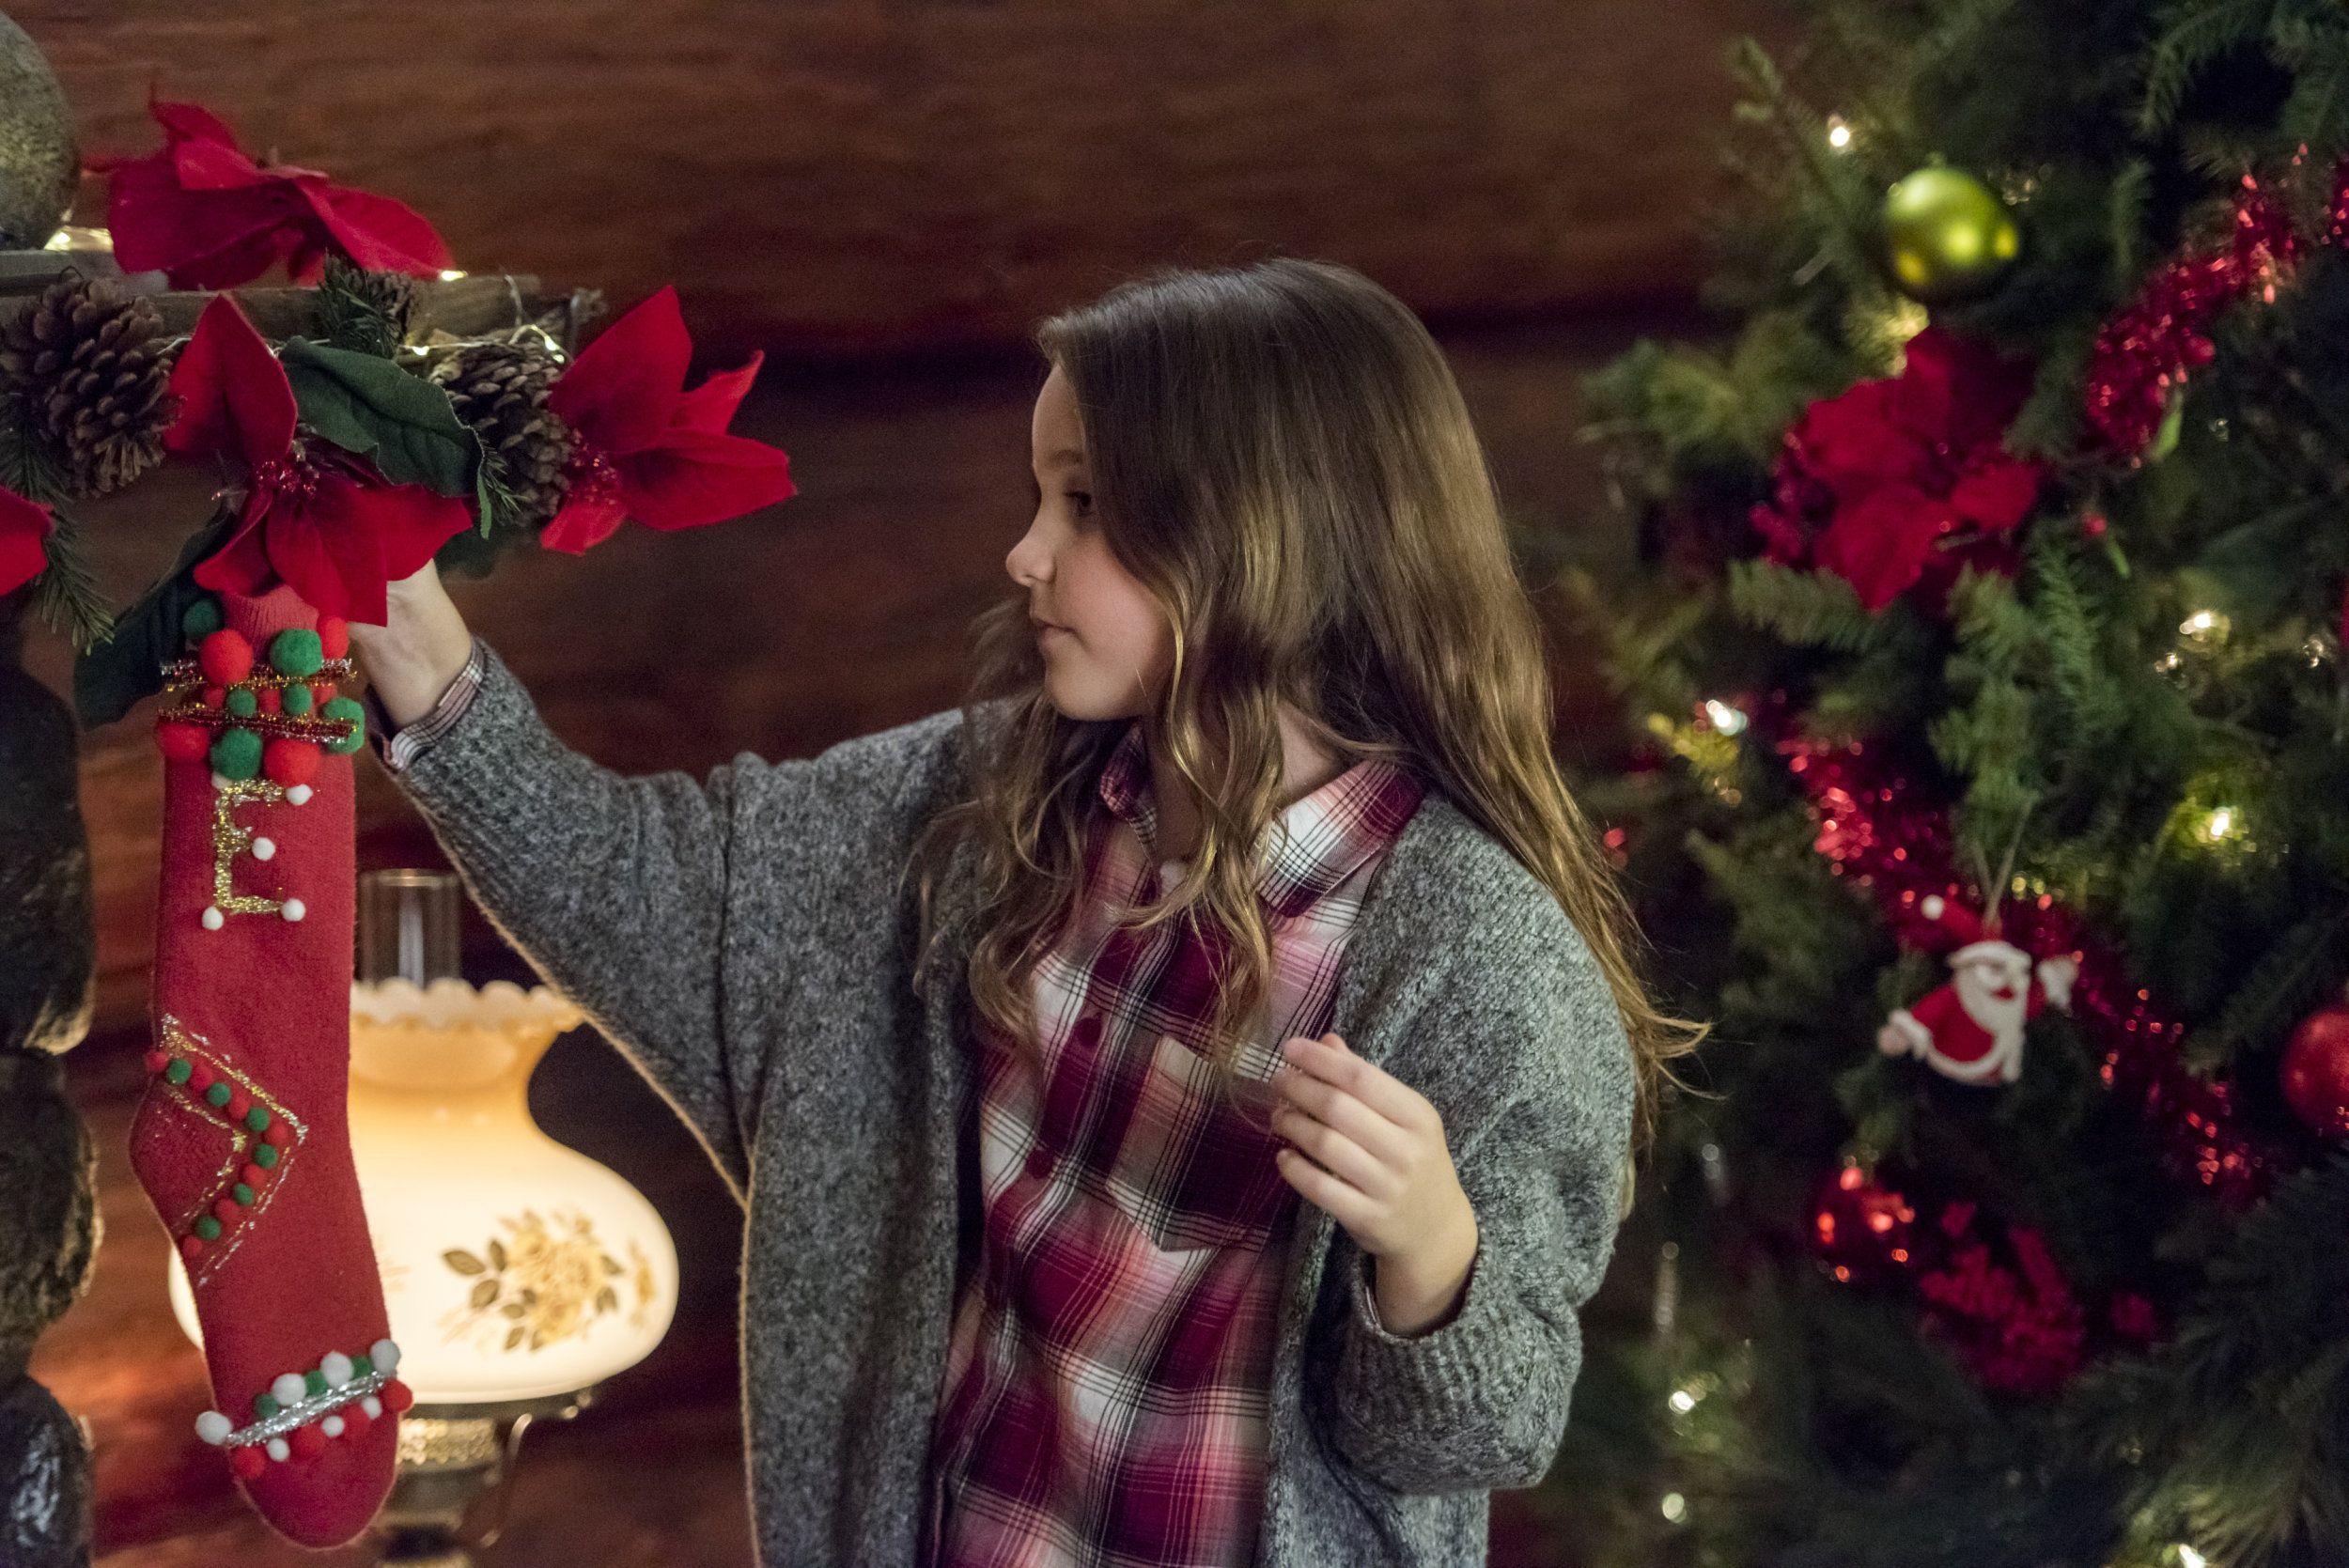 Christmas Getaway Hallmark Movie.Check Out Photos From The Hallmark Channel Original Movie